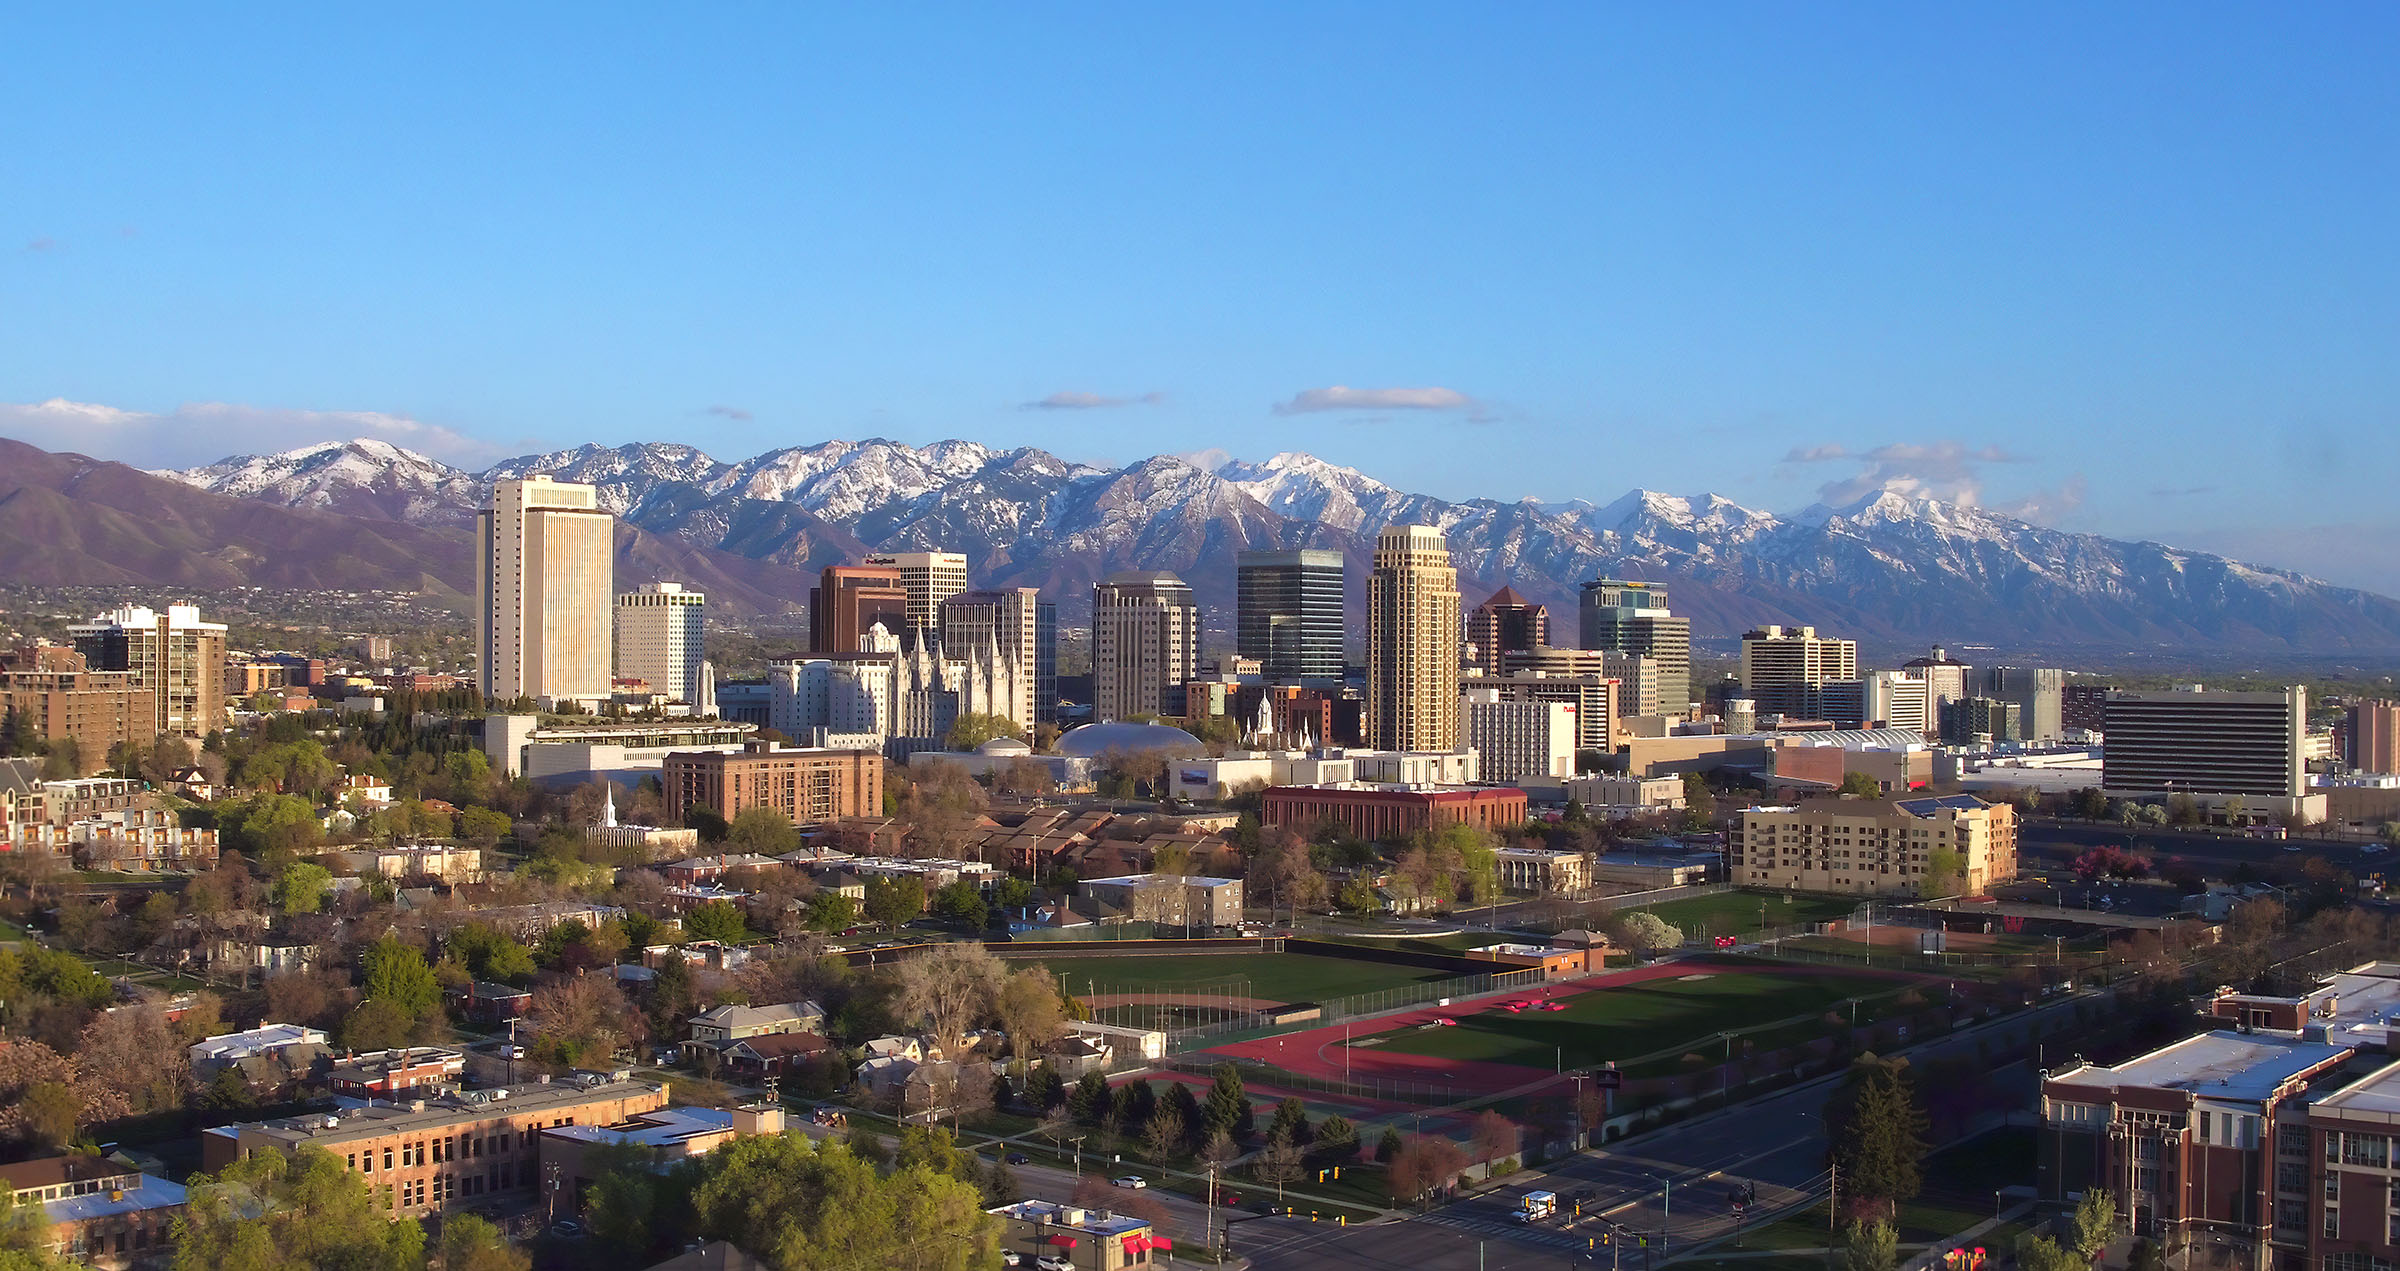 Skyline of Salt Lake City